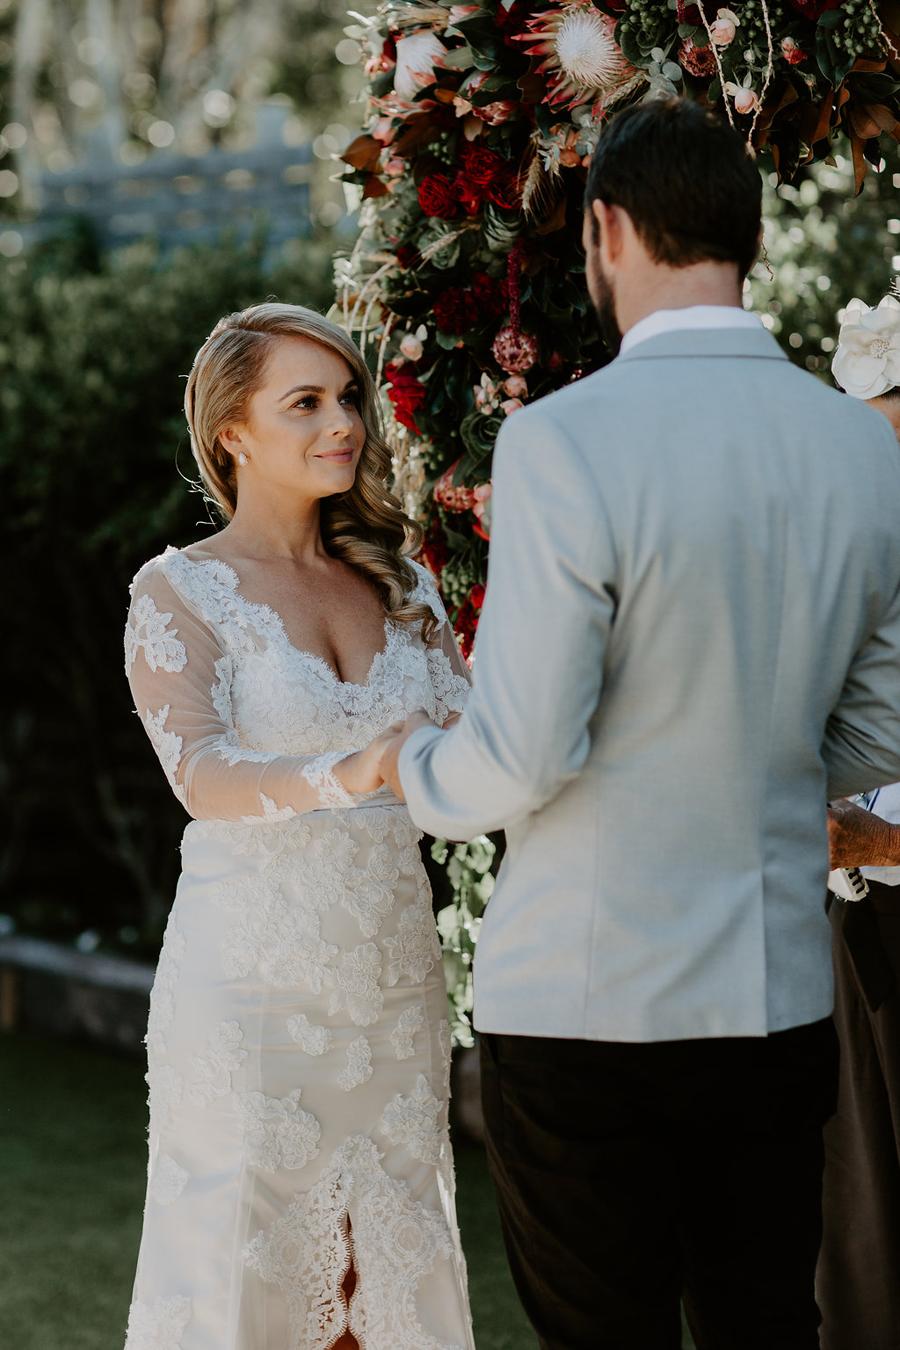 osteria-casuarina-wedding-venue-tweed-coast-weddings-coastal-garden-reception-real-wedding017.jpg